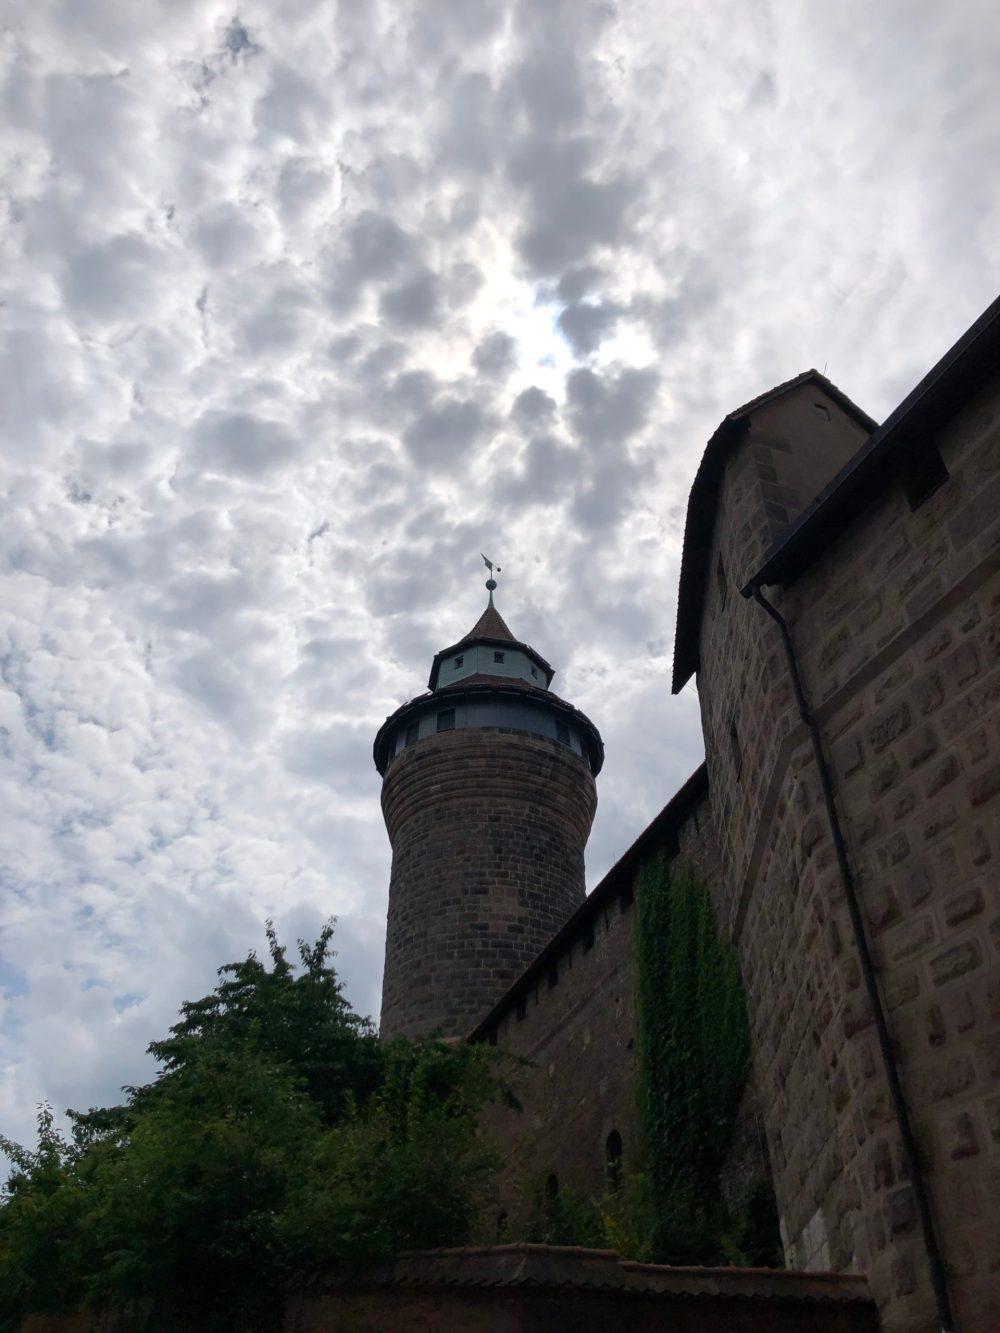 Burgturm unterm Wolkenmeer